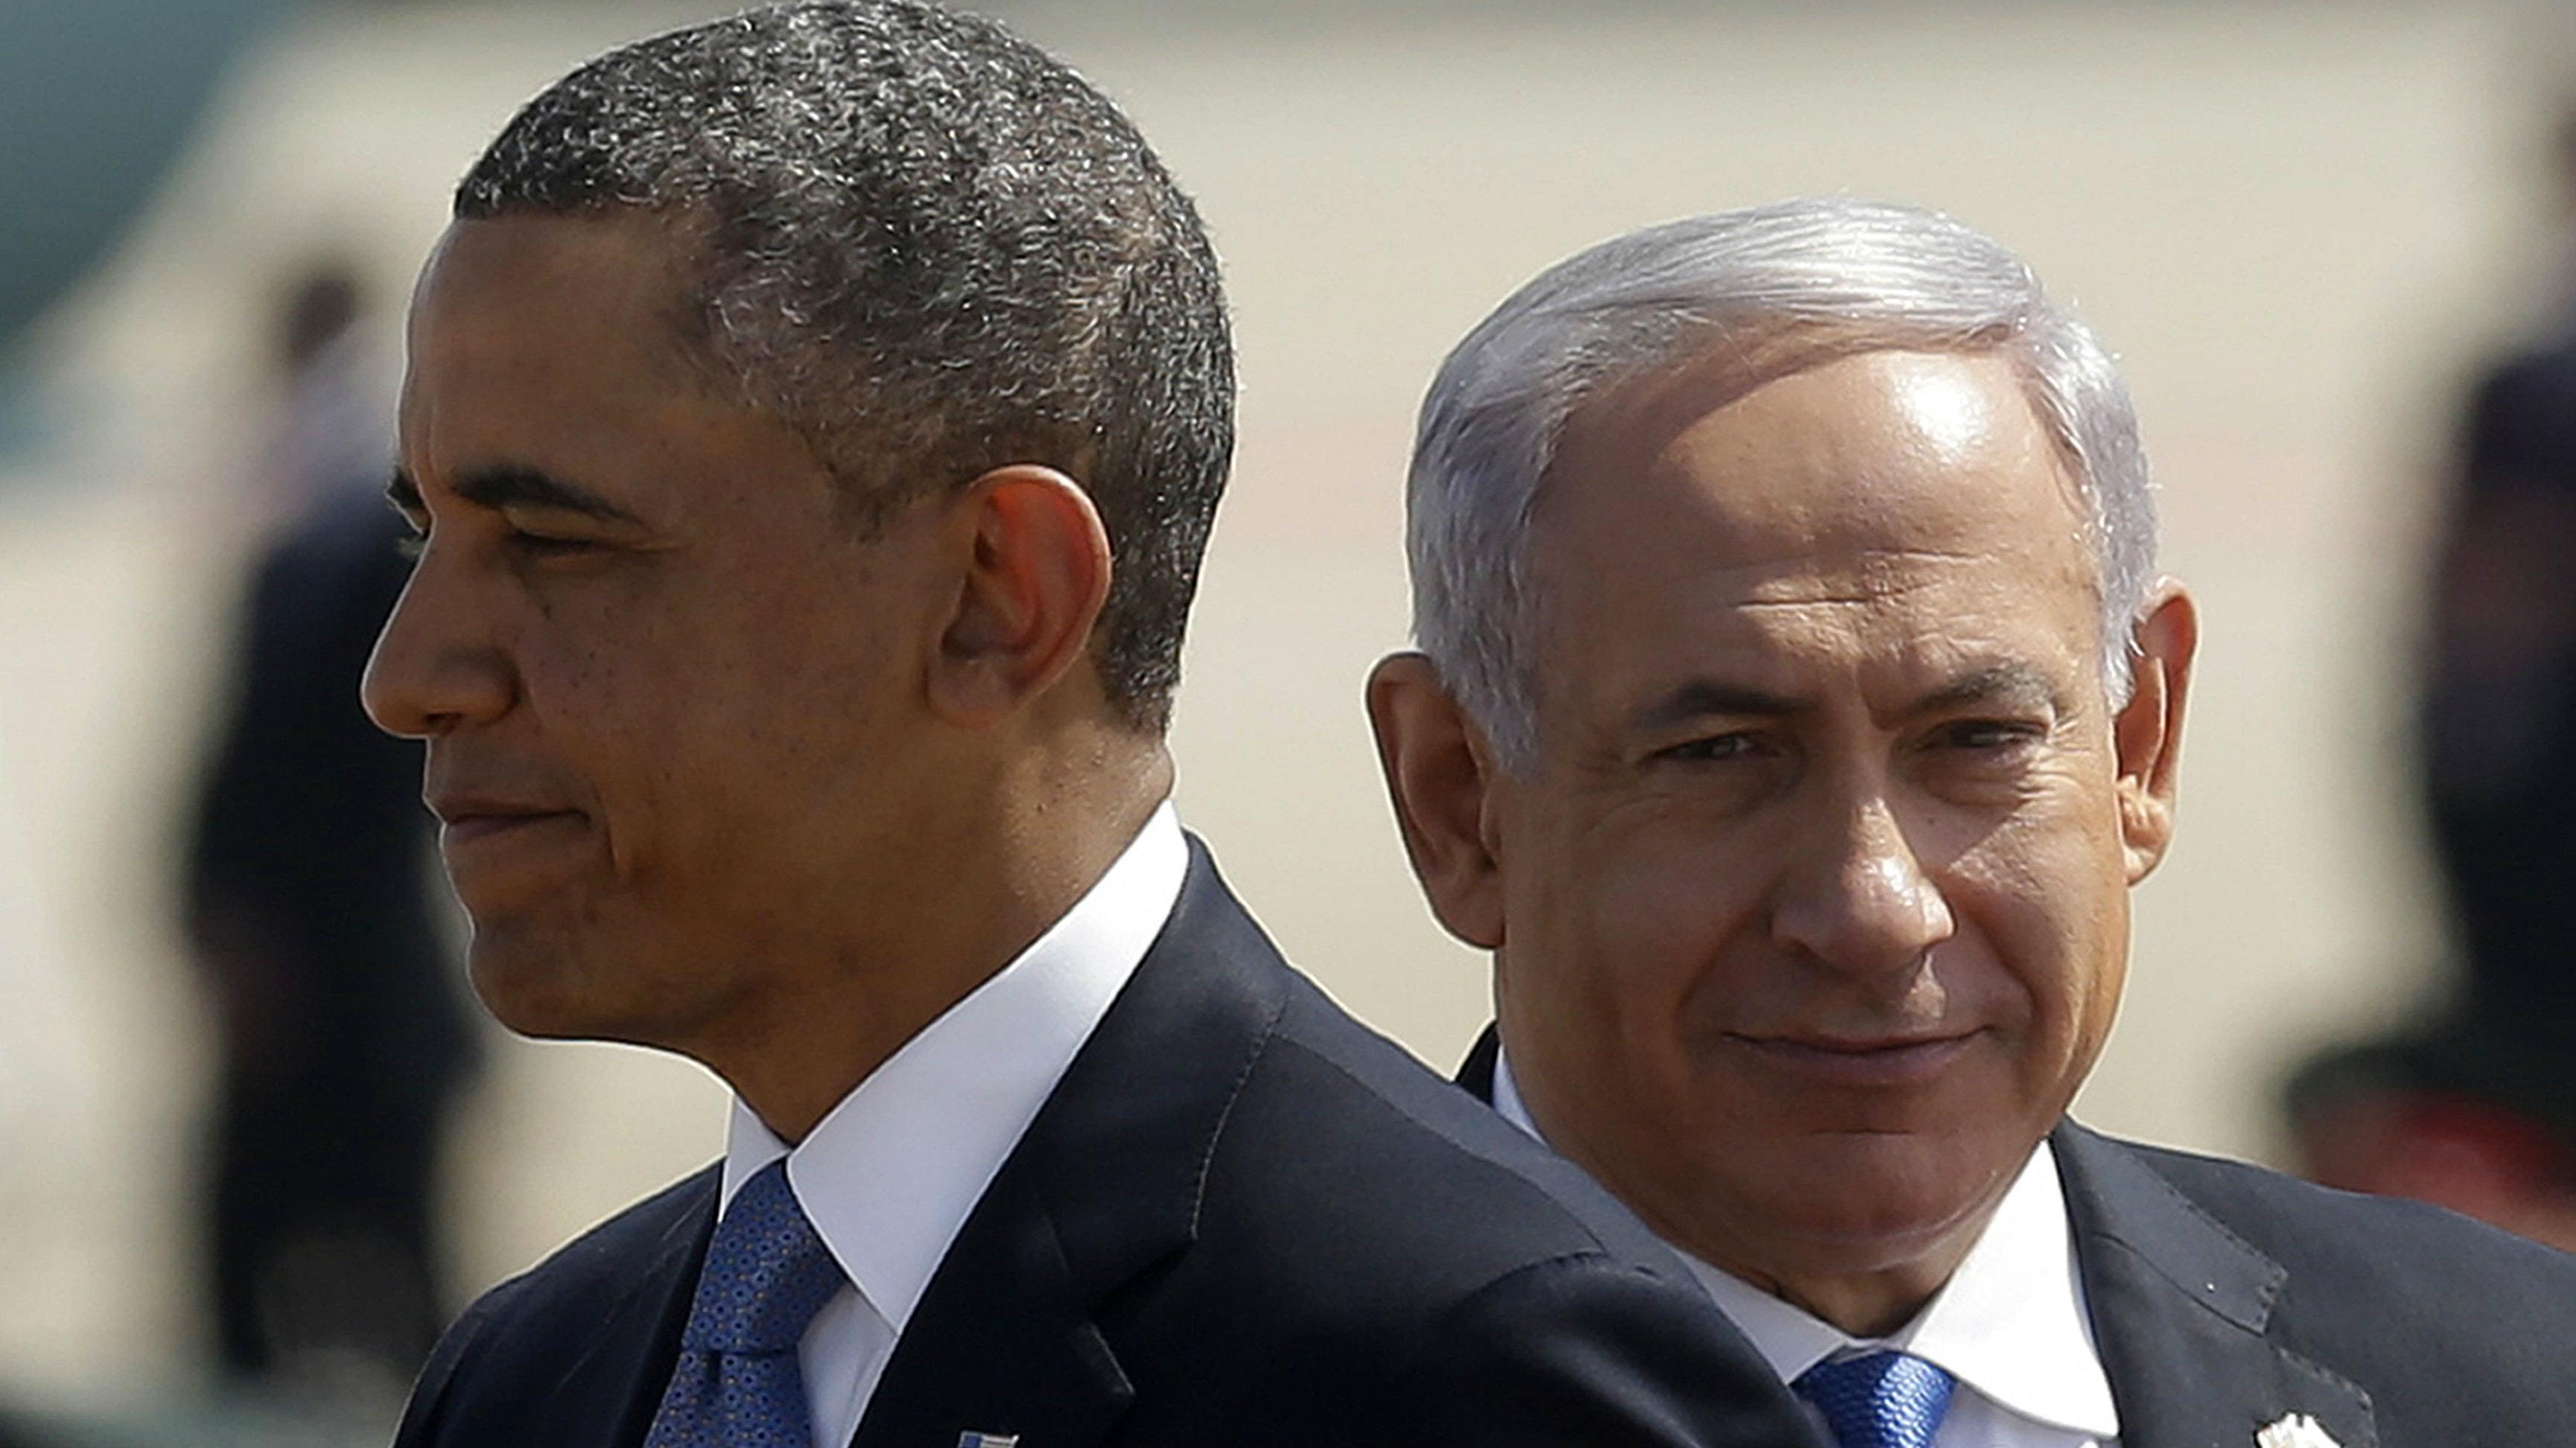 President Barack Obama, left, with Israeli Prime Minister Benjamin Netanyahu, right, during his arrival ceremony at Ben Gurion International Airport in Tel Aviv, Israel, Wednesday, March 20, 2013.